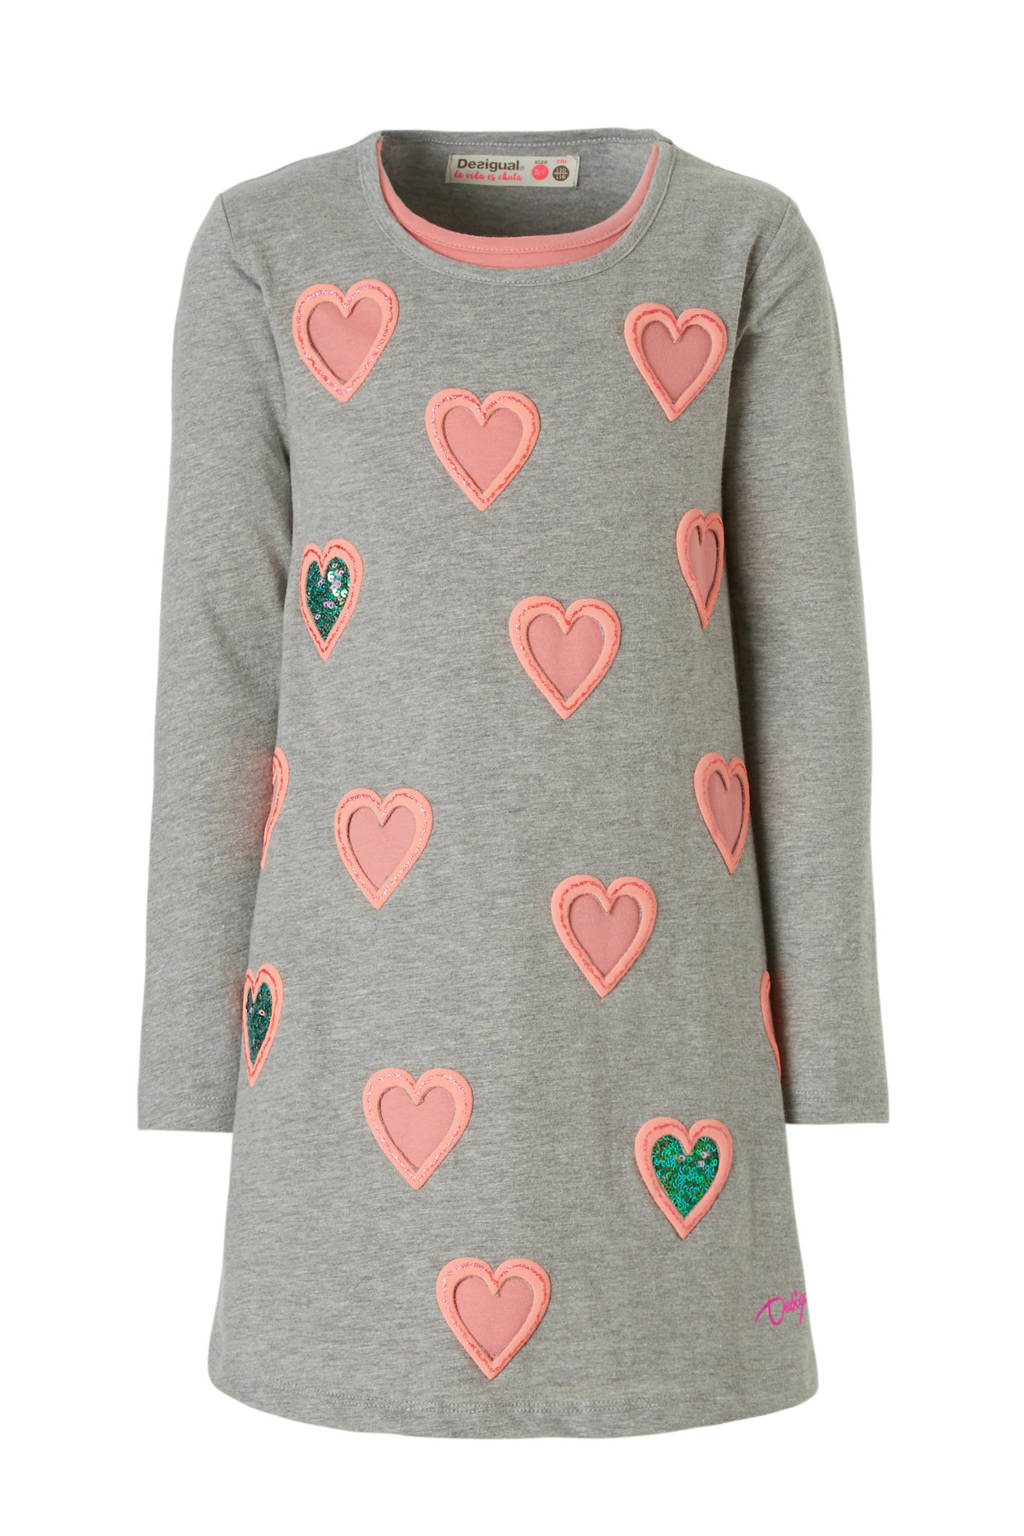 Desigual A-lijn jurk met hartjes print, Lichtgrijs